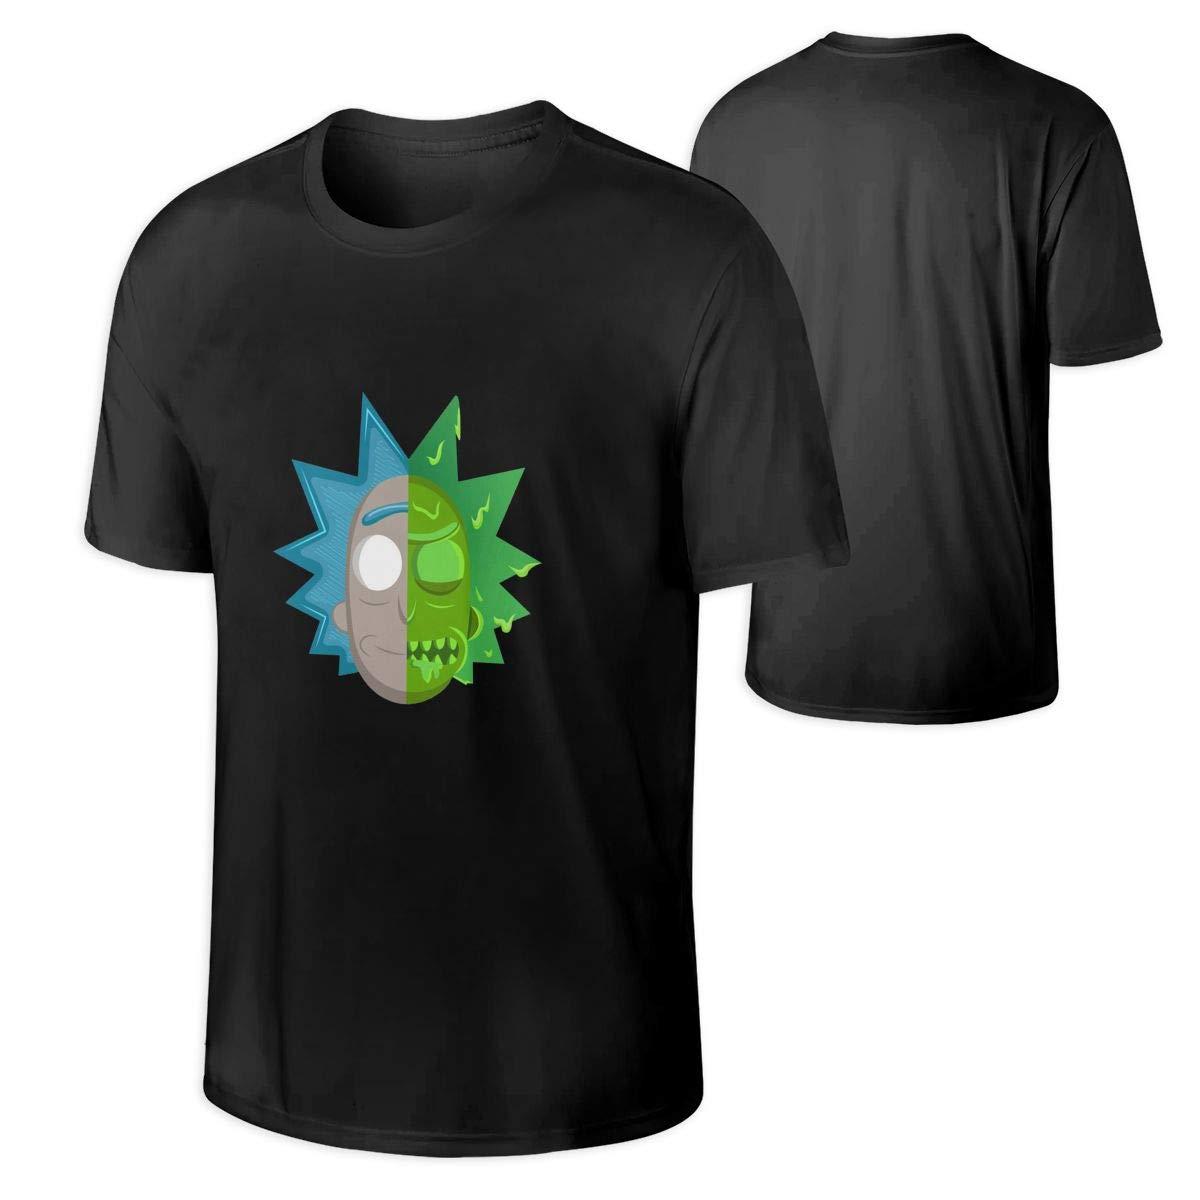 Ruzo0jkghj Rick N Morty Half Toxic Face T Shirt 6557